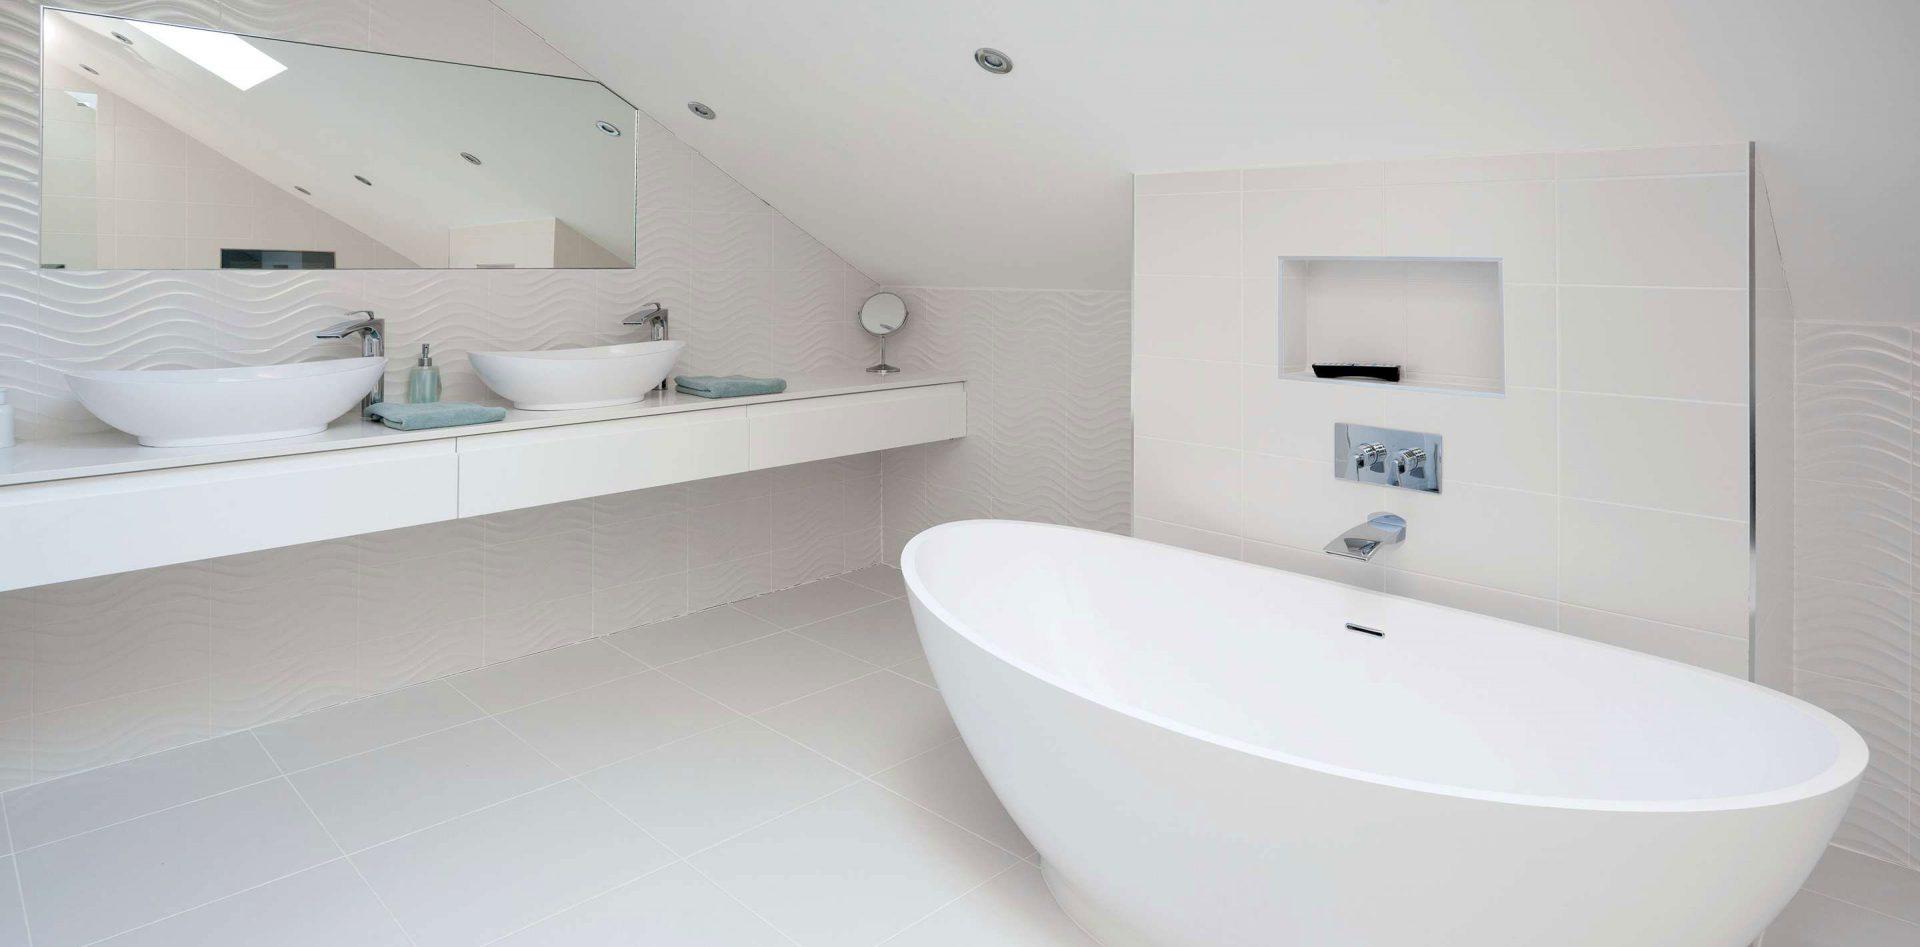 Foxwood bathroom installation